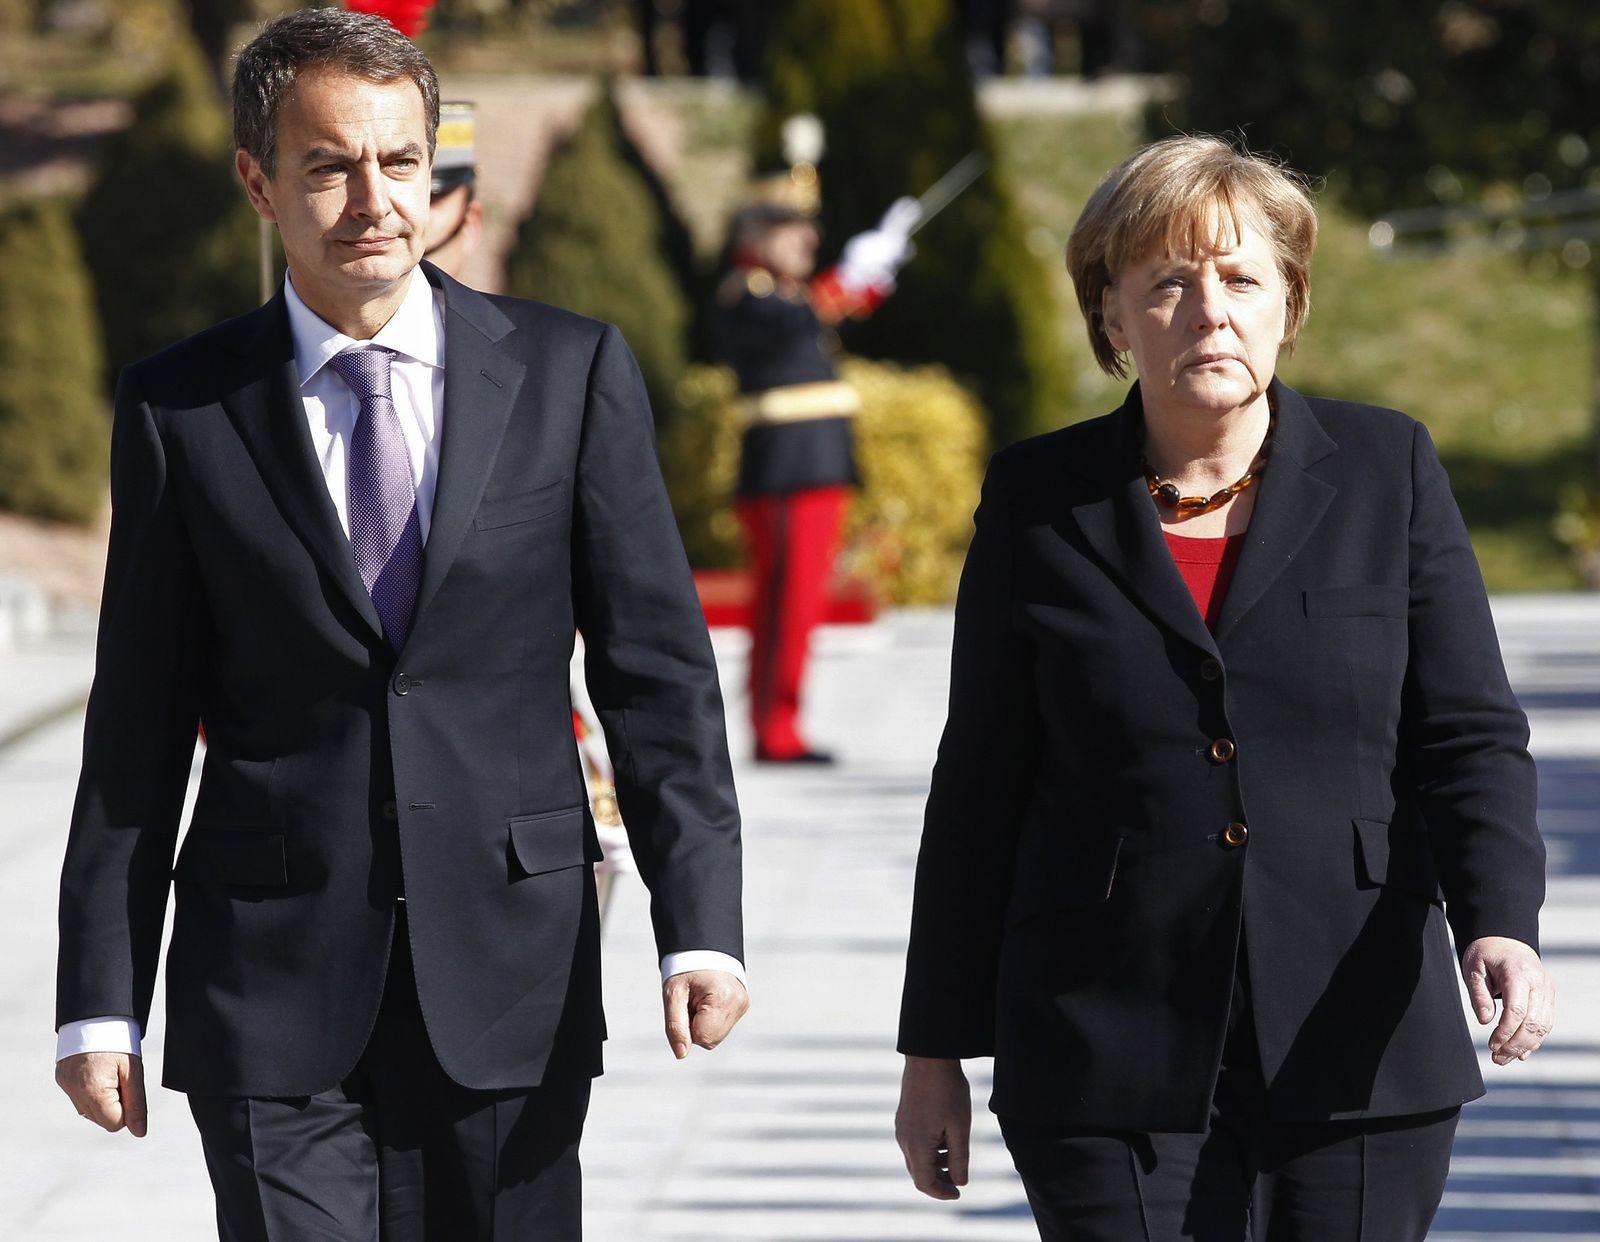 Angela Merkel / Jose Luis Rodriguez Zapatero